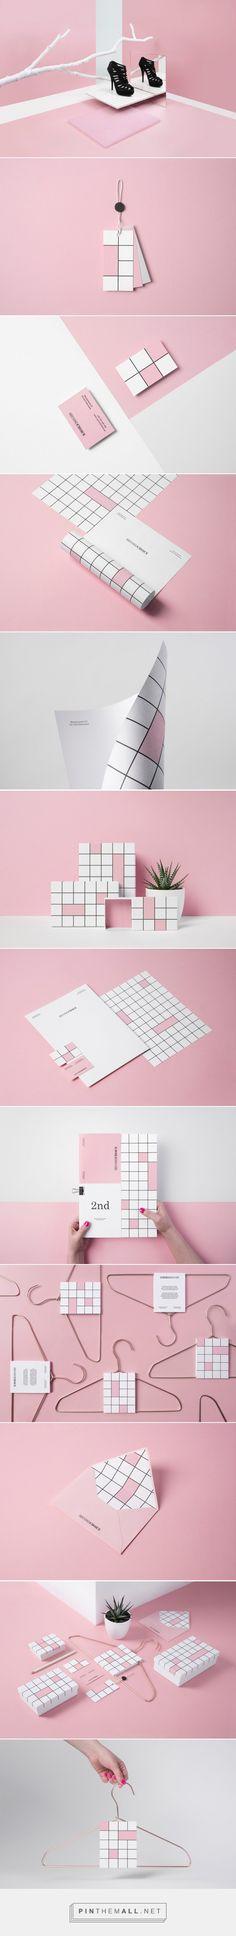 Lovely usage of blocks - Second Choice fashion brand design by Noeeko (Poland) - http://www.packagingoftheworld.com/2016/06/second-choice.html